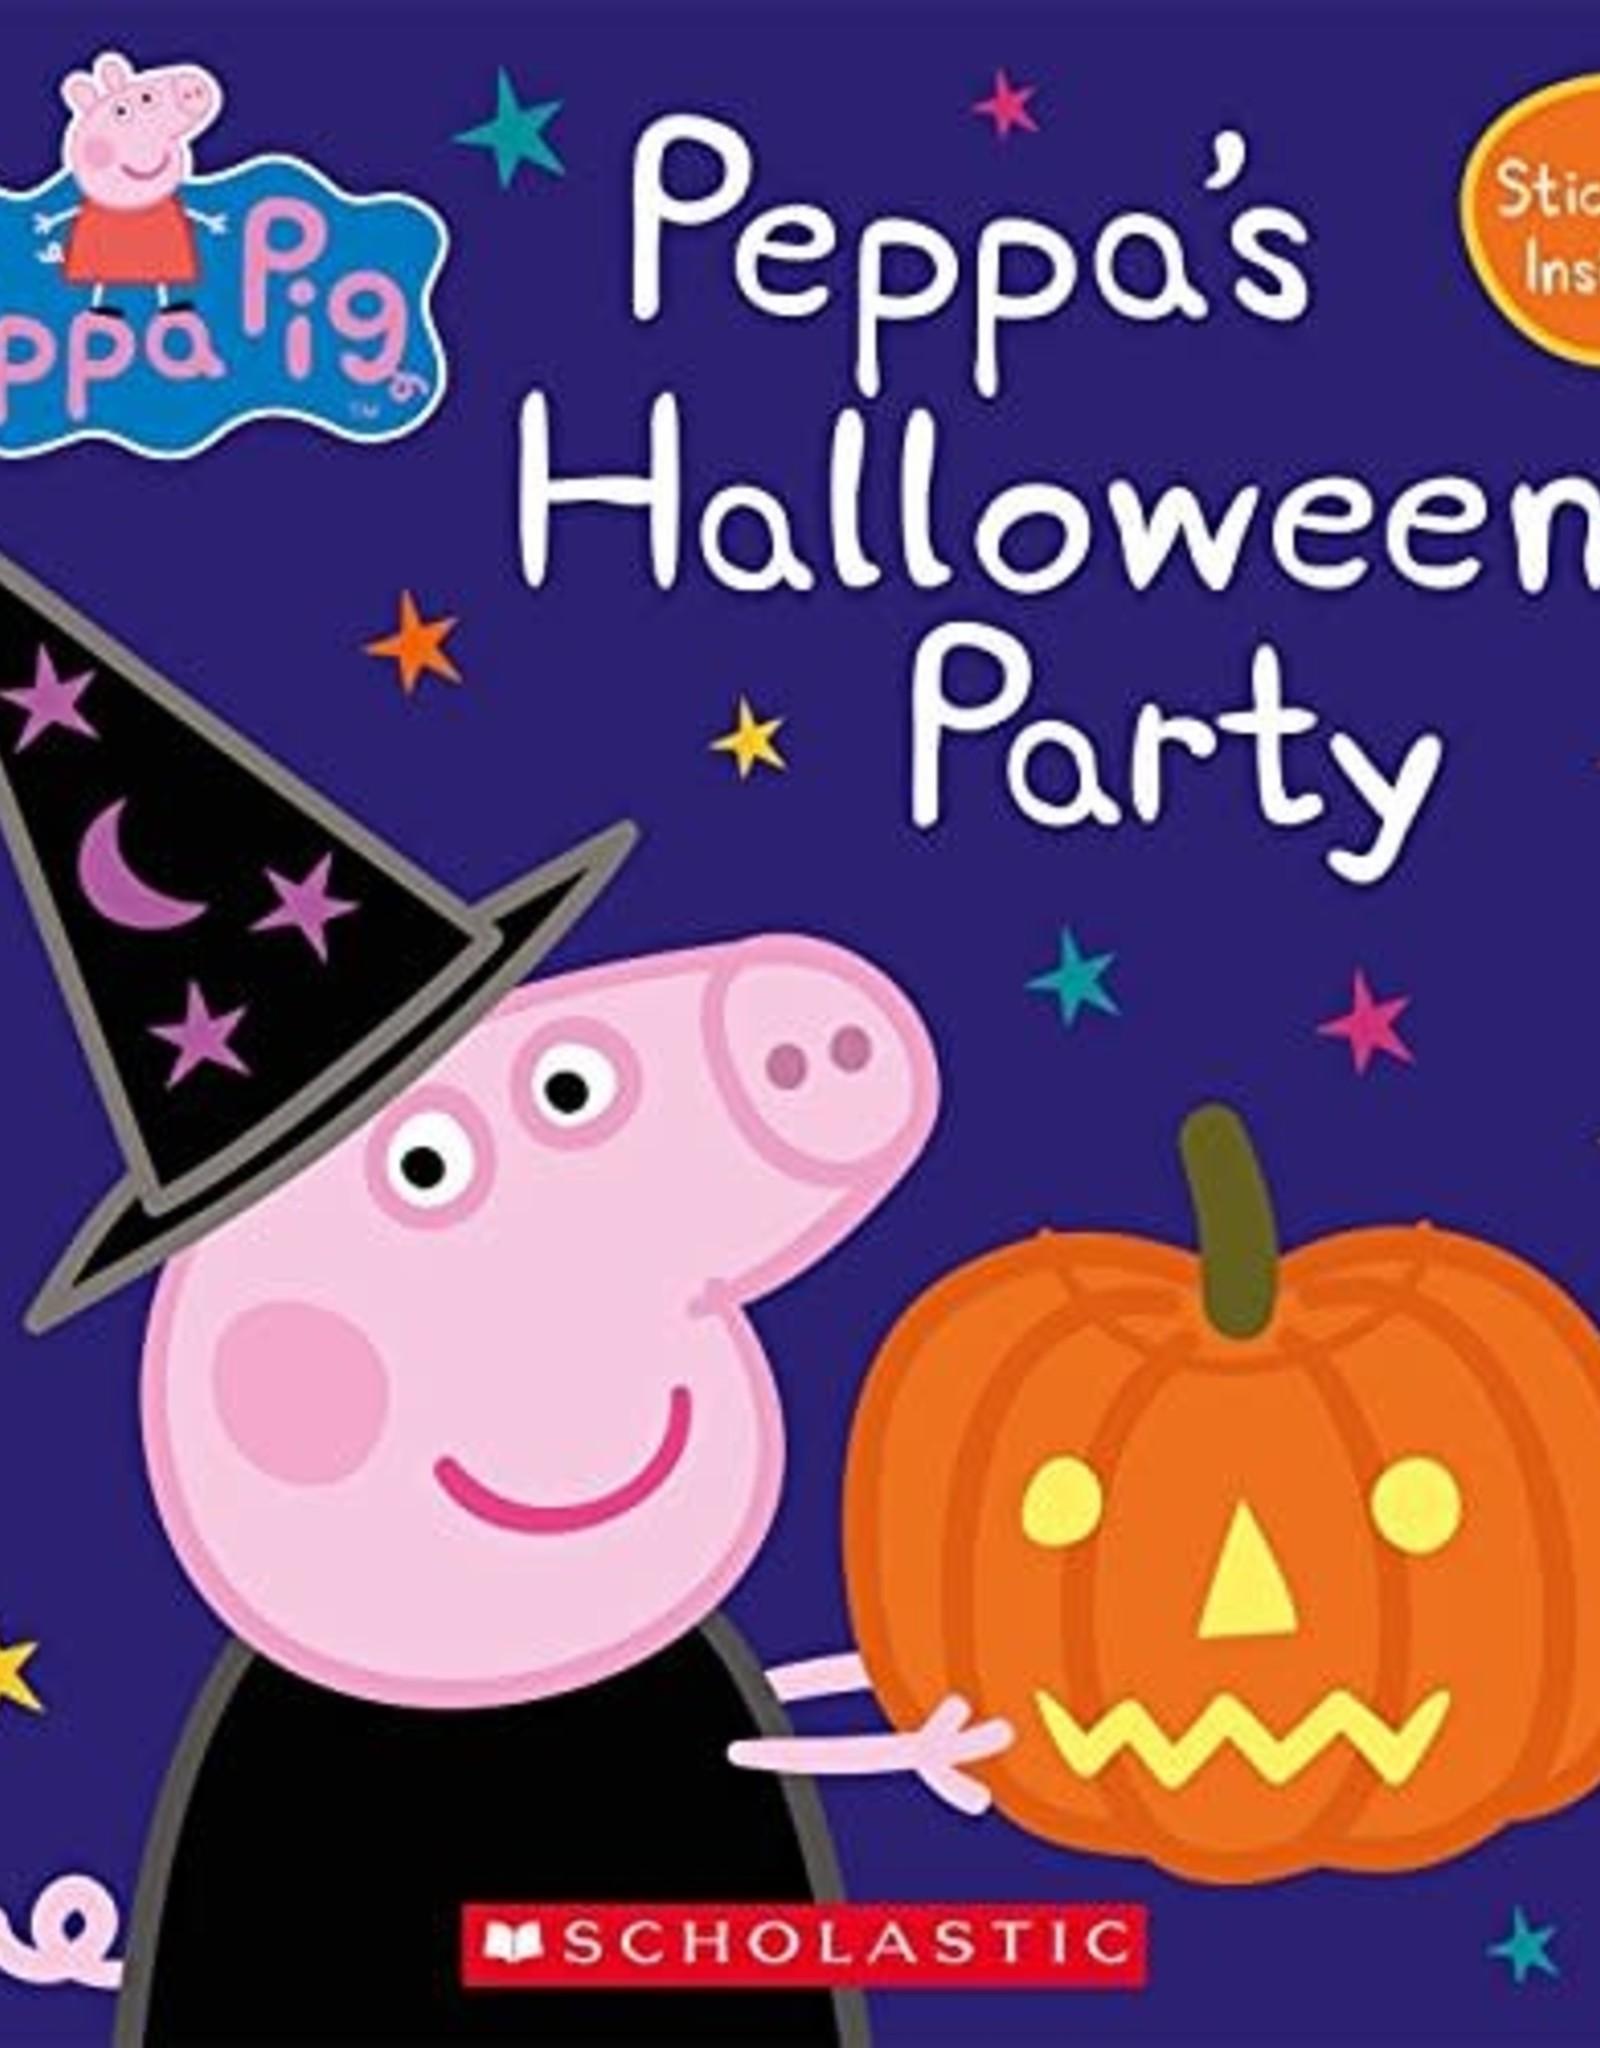 Scholastic Peppa Pig Peppa's Halloween Party